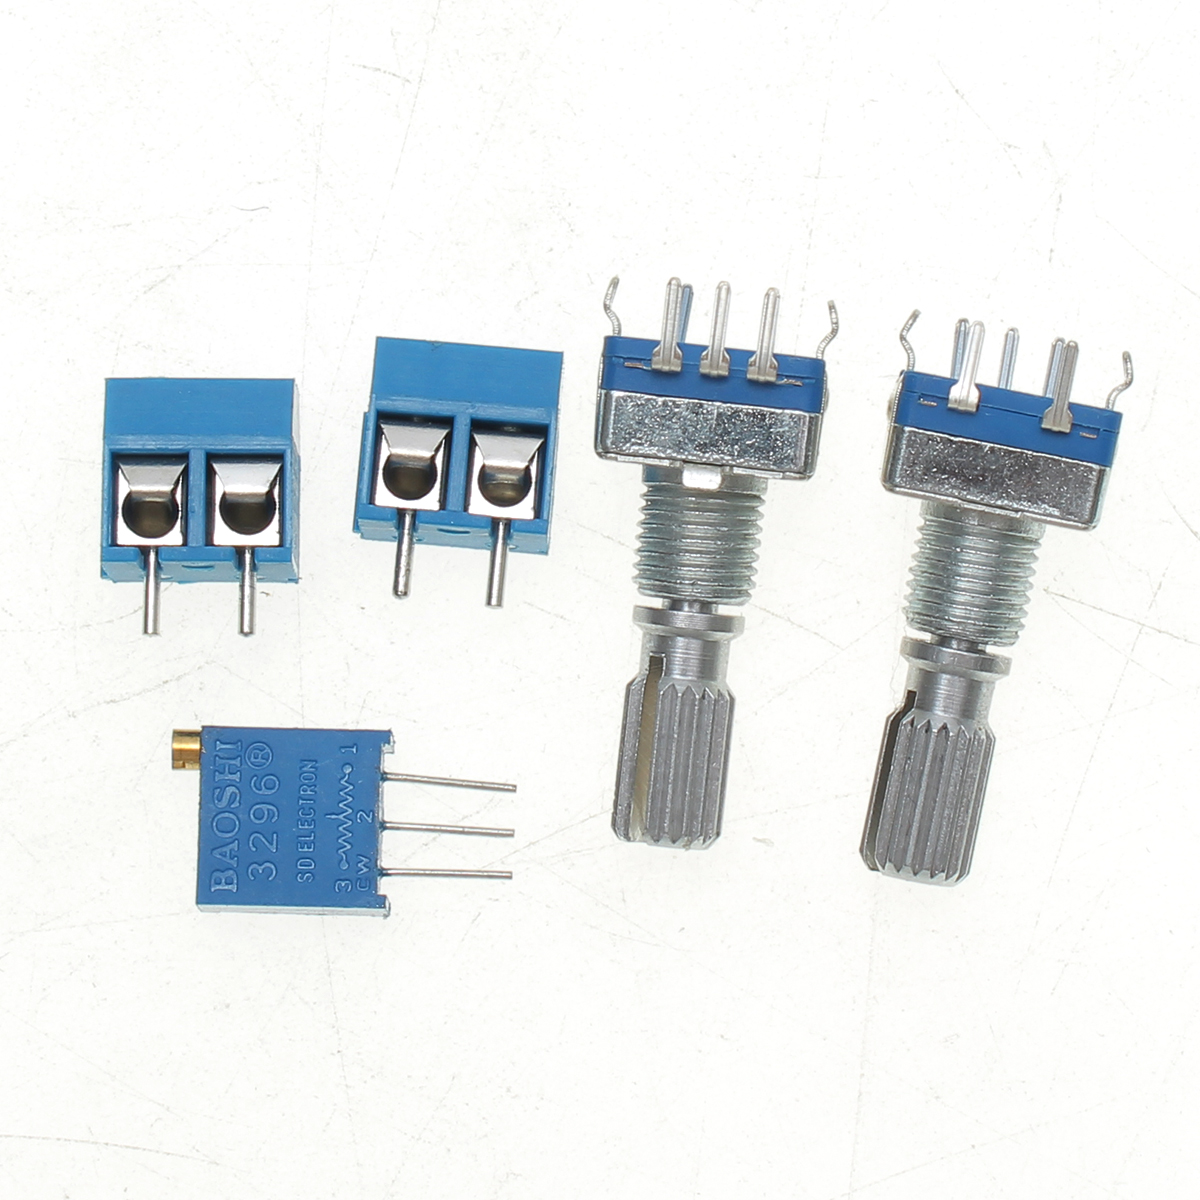 0 28v 001 2a Adjustable Dc Regulated Power Supply Diy Kit Short Current Limiting Circuit F2e80d36 29c8 4890 8d89 47df17288de9